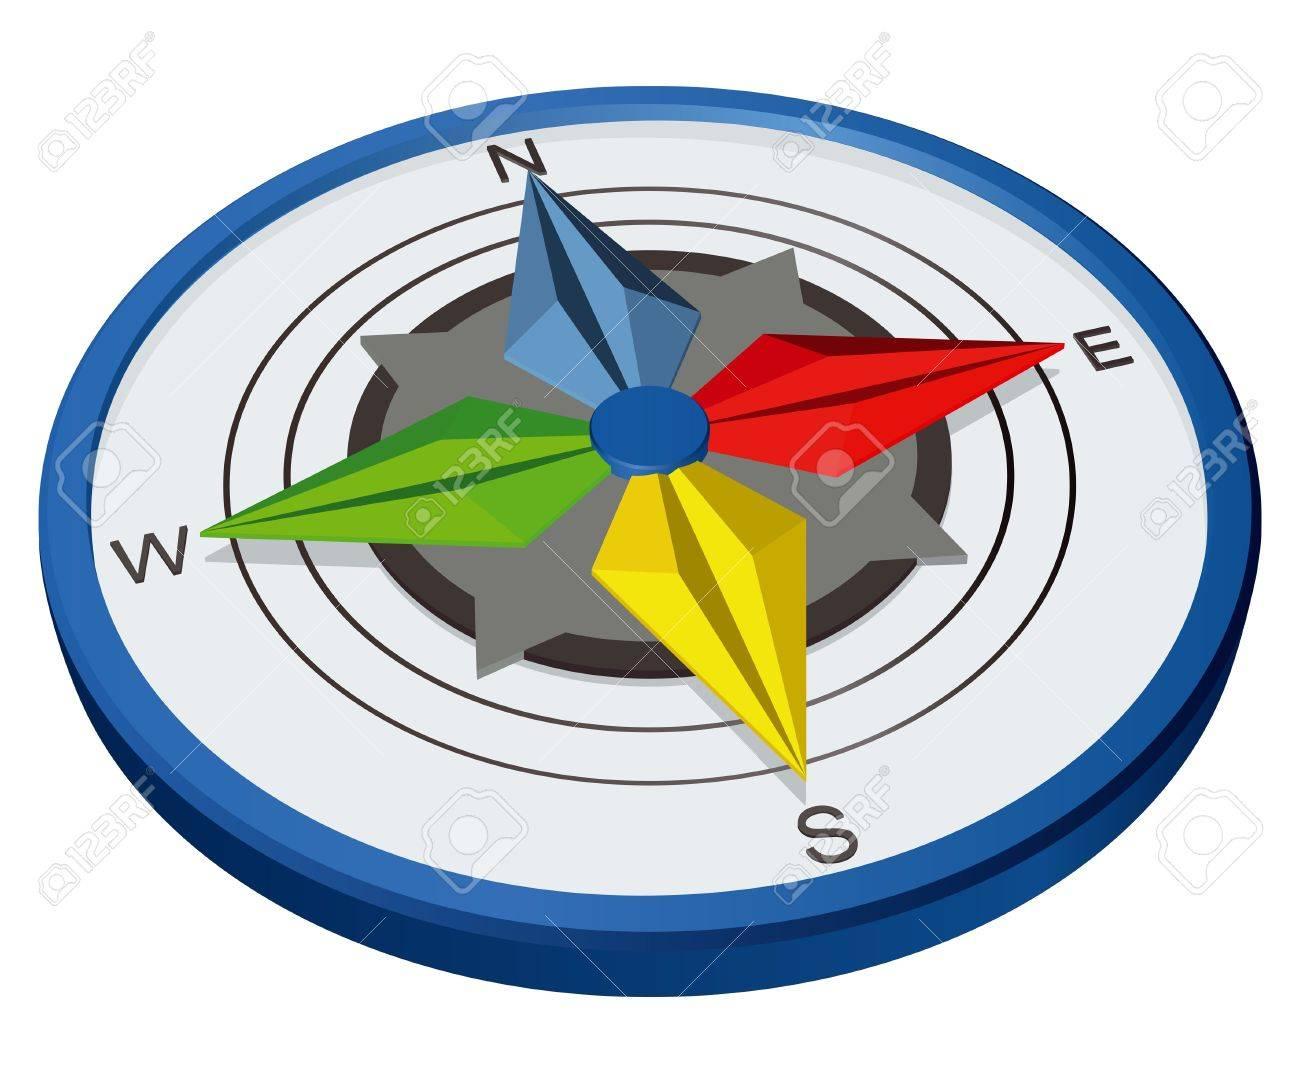 Navigation compass Stock Vector - 11031506